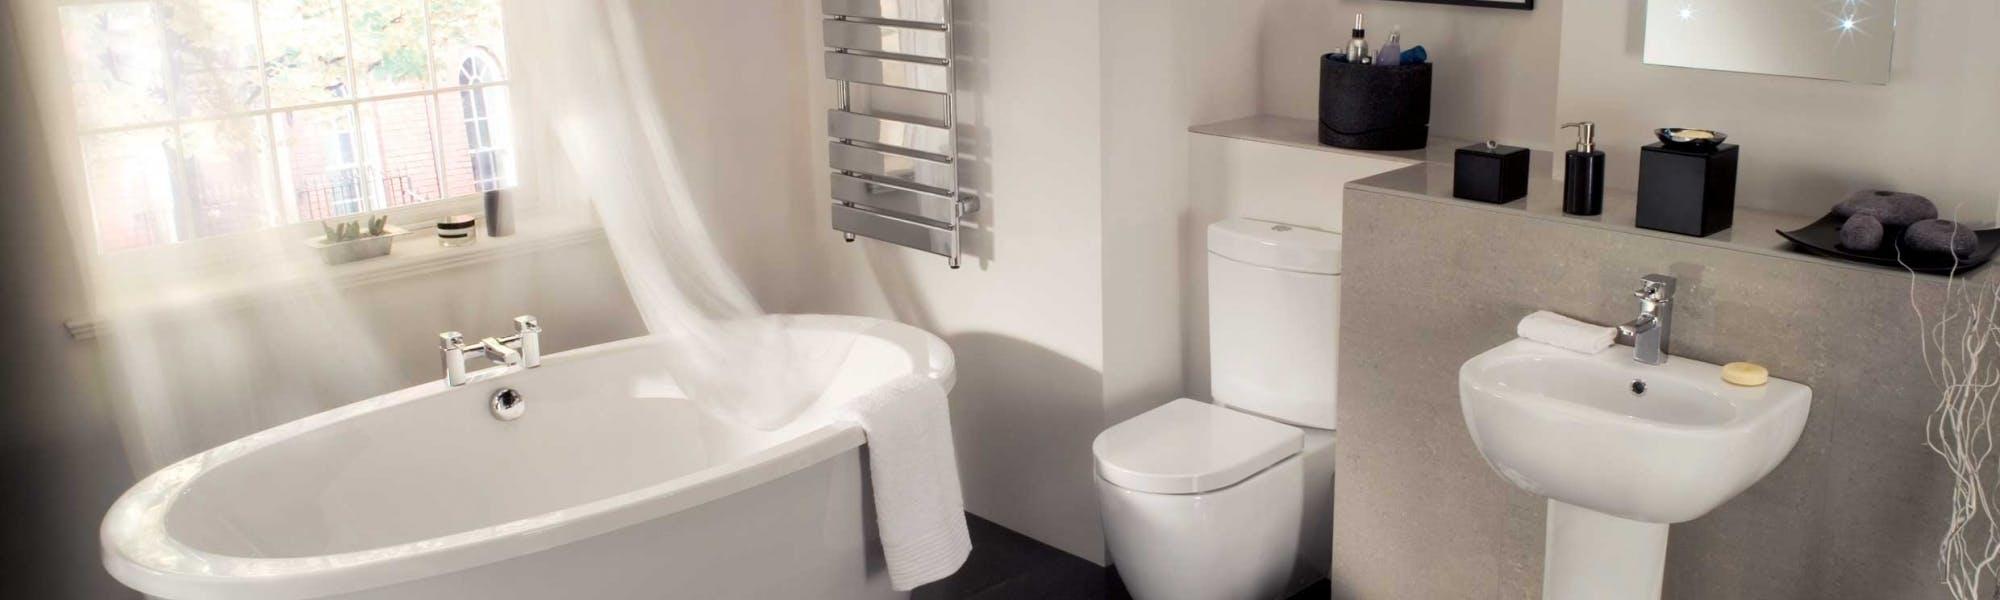 modern bathrooms - designed, supplied & installed